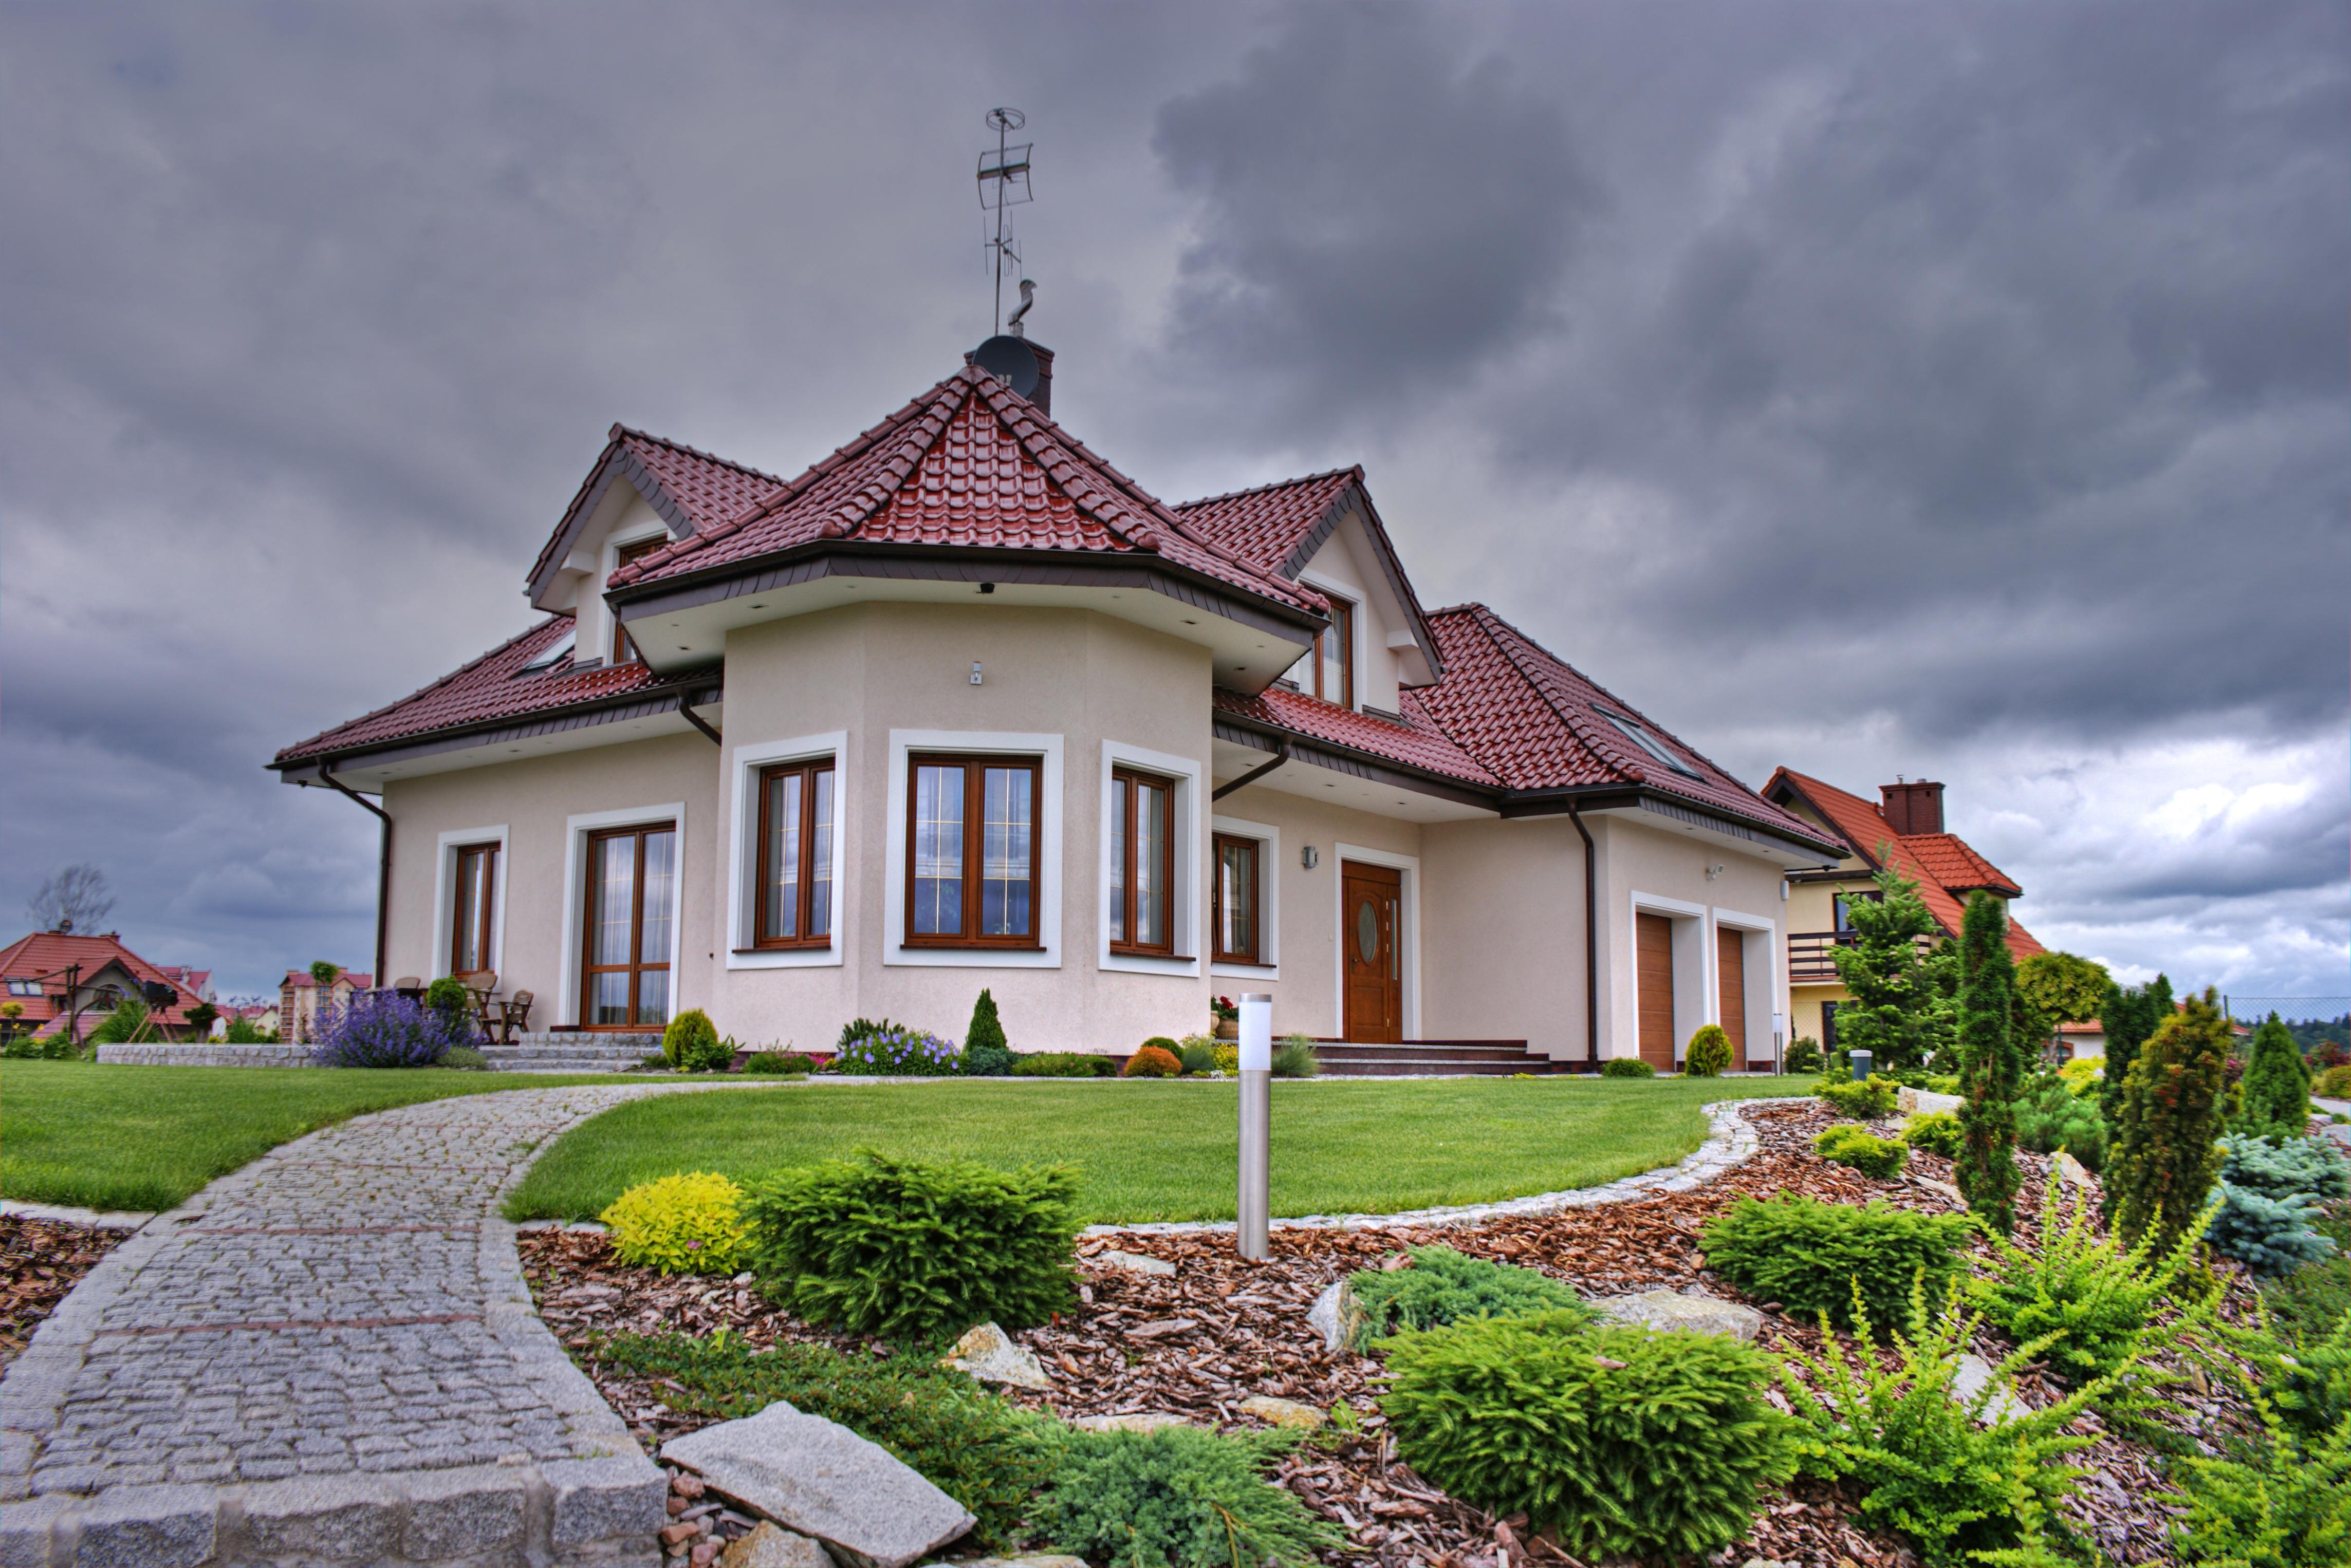 house from www.sxc.hu